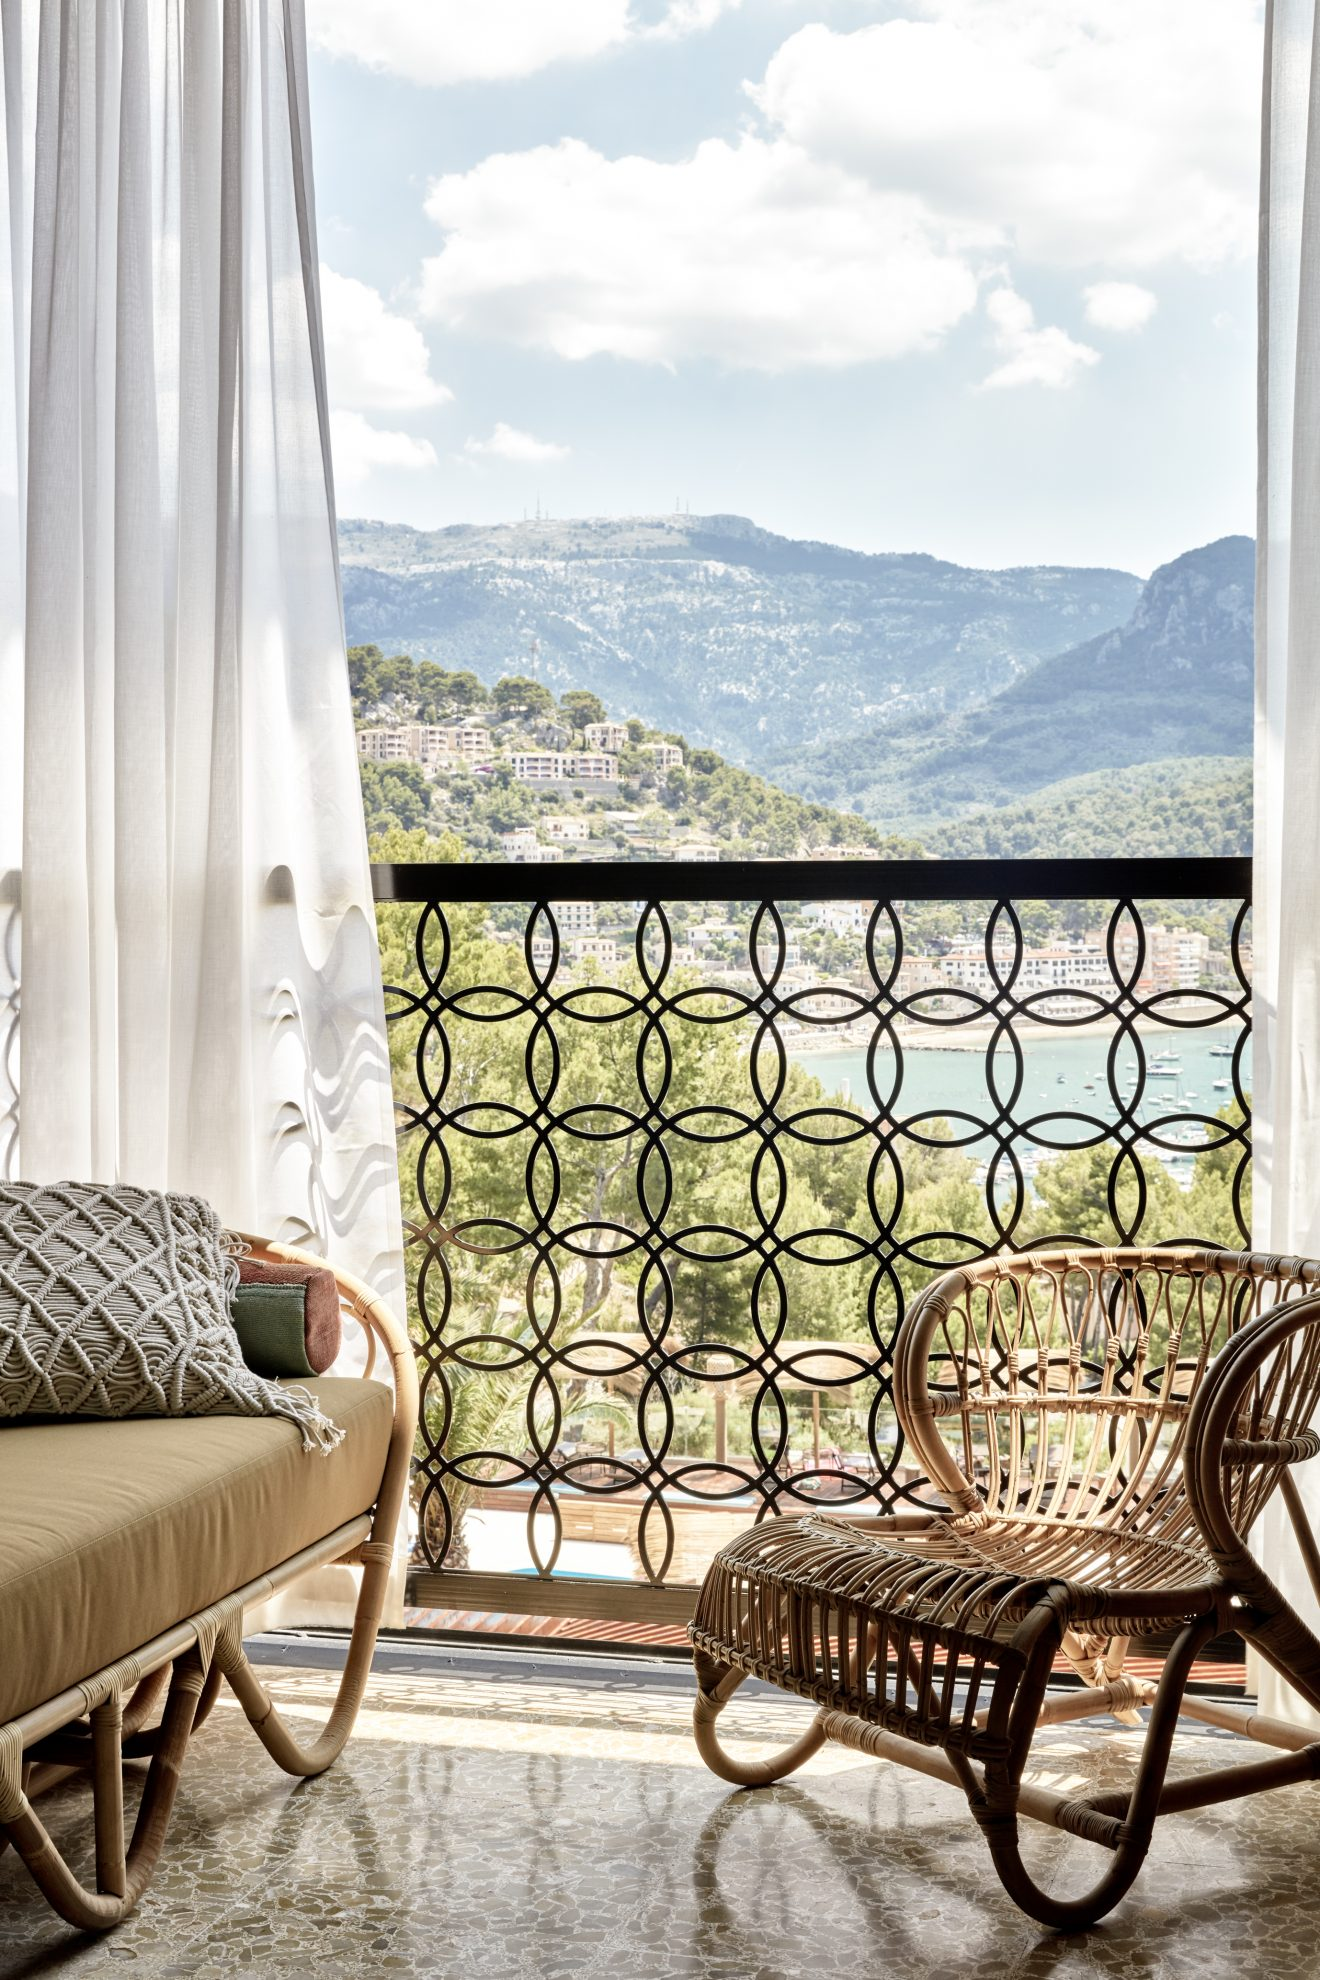 Bikini-Hotels-Mallorca-Online-Listing